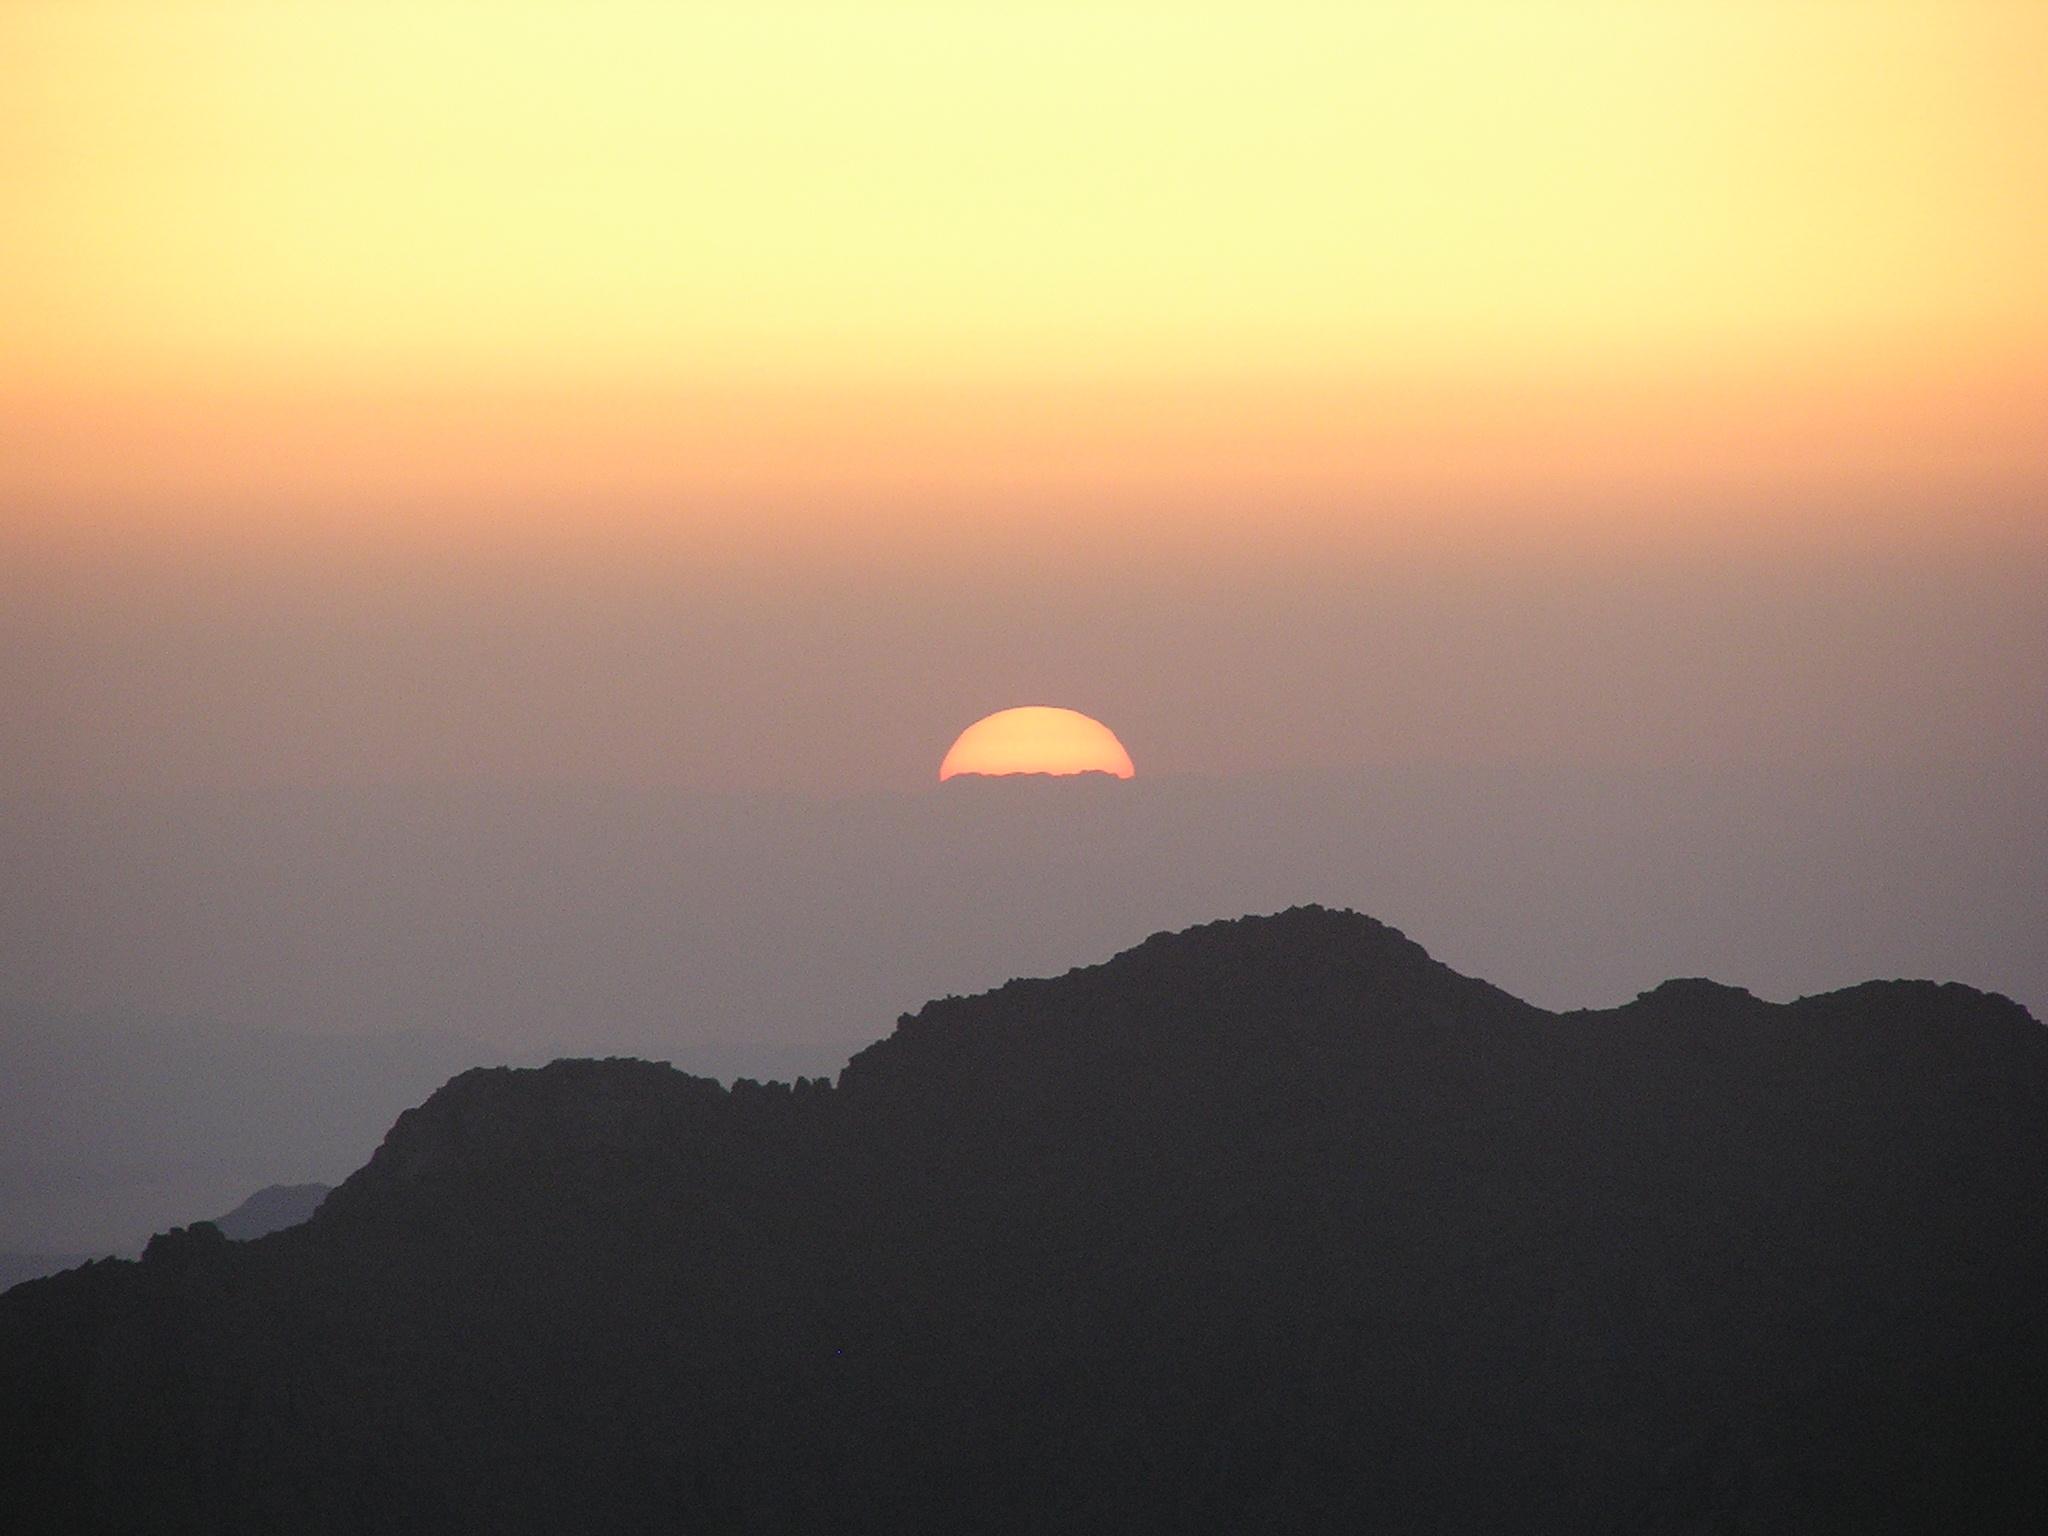 English: Sunrise on Mt. Sinai in Egypt